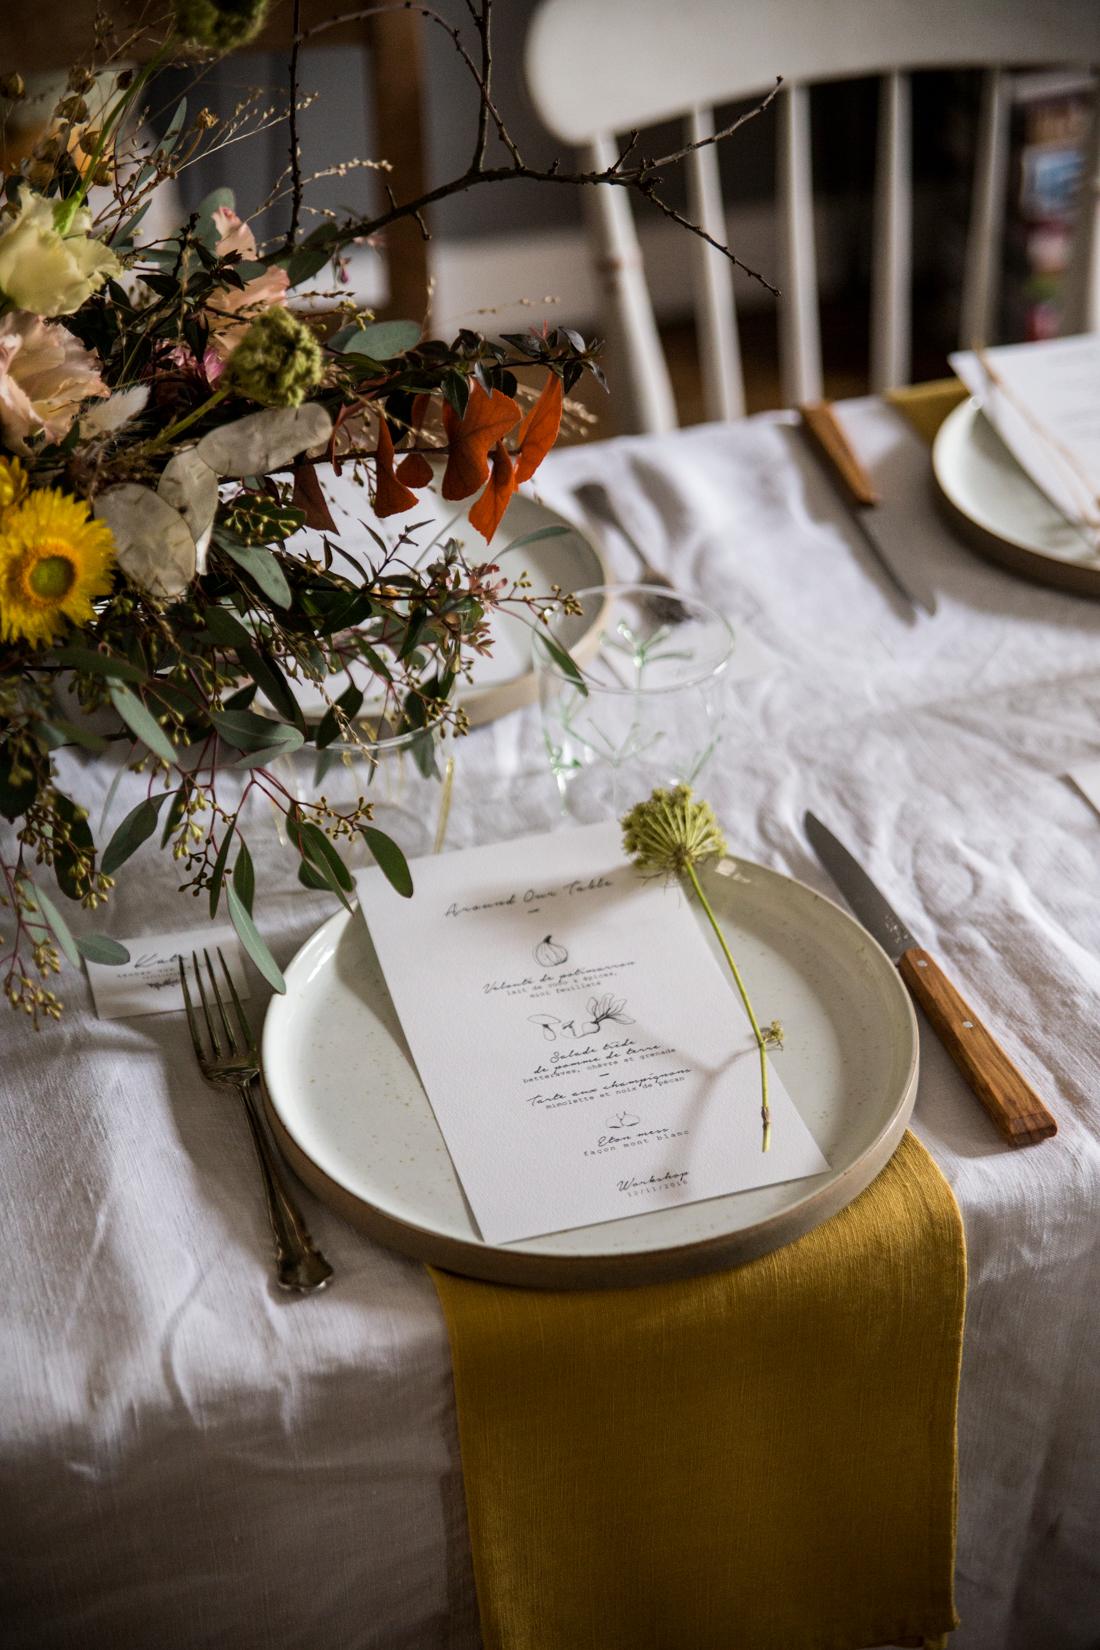 table-workshop-ophelies-kitchen-book-ophelie-lauret-8